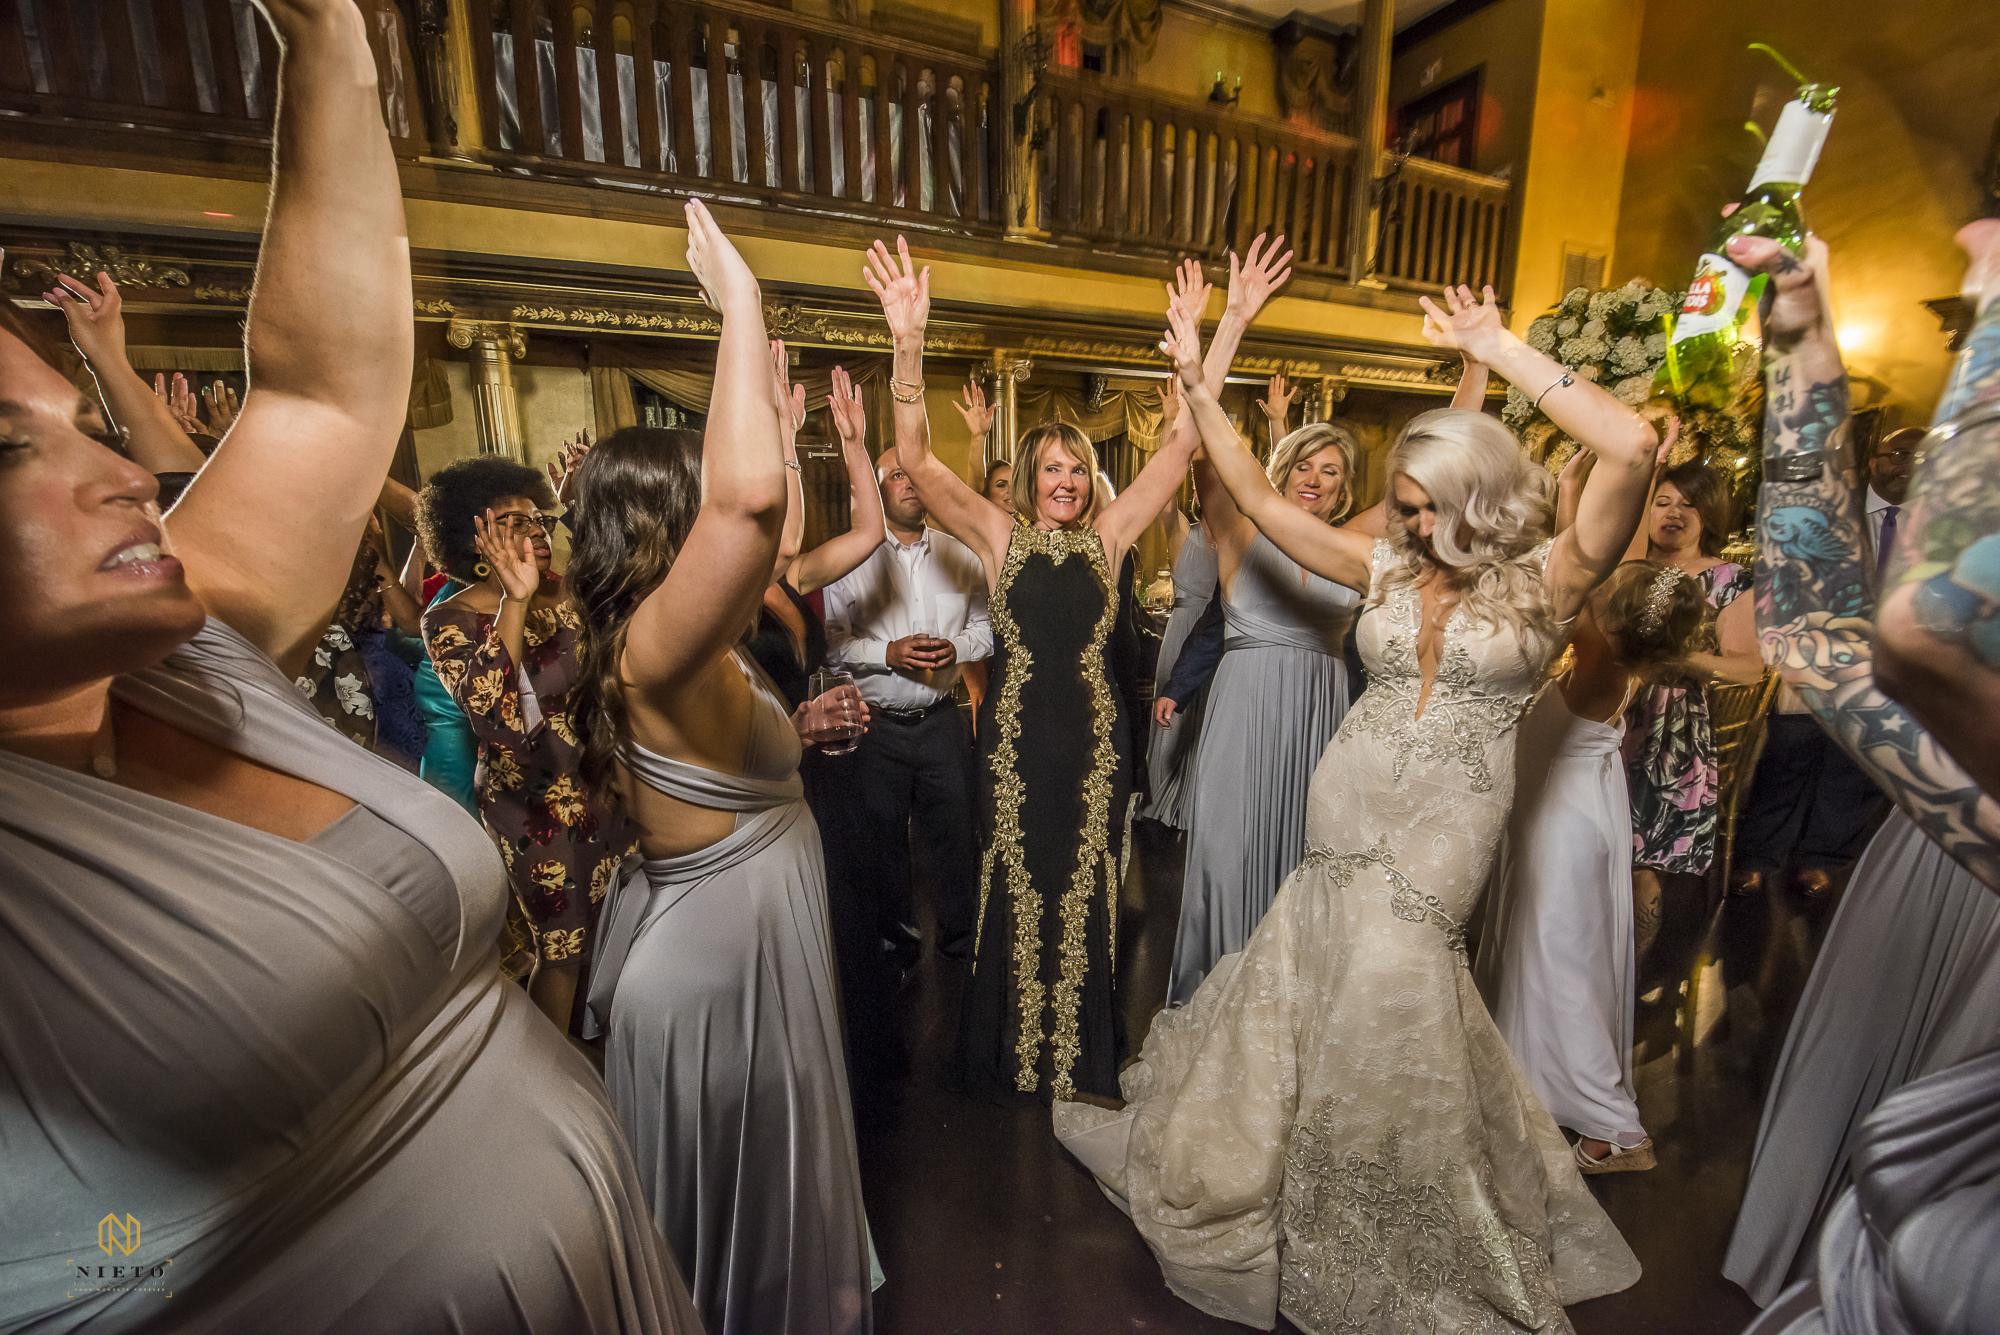 Barclay Villa Wedding - Tegran & Suzanne - 00624 Higgs - Fraites Nieto Photography.jpg